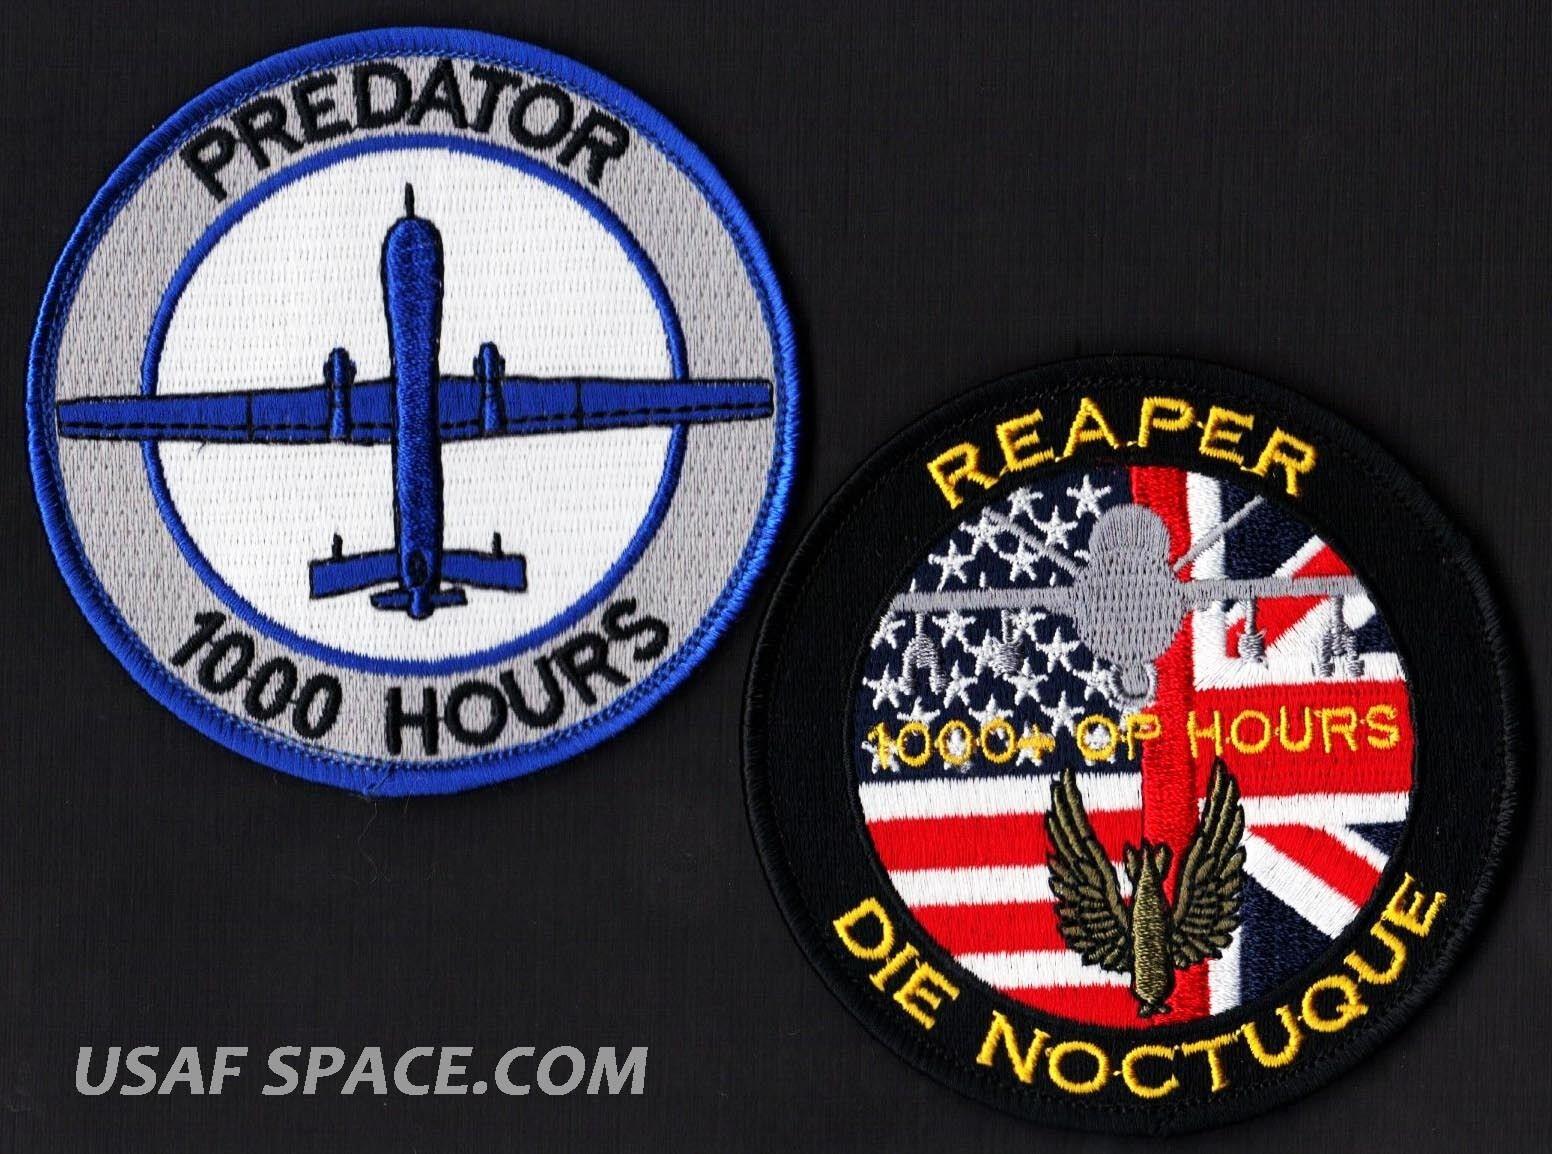 USAF P rojo rojo rojo ator MQ-1 1000 Horas - Royal Air Force Reaper MQ-9 2 Ucav Parche Juego 3ac32e